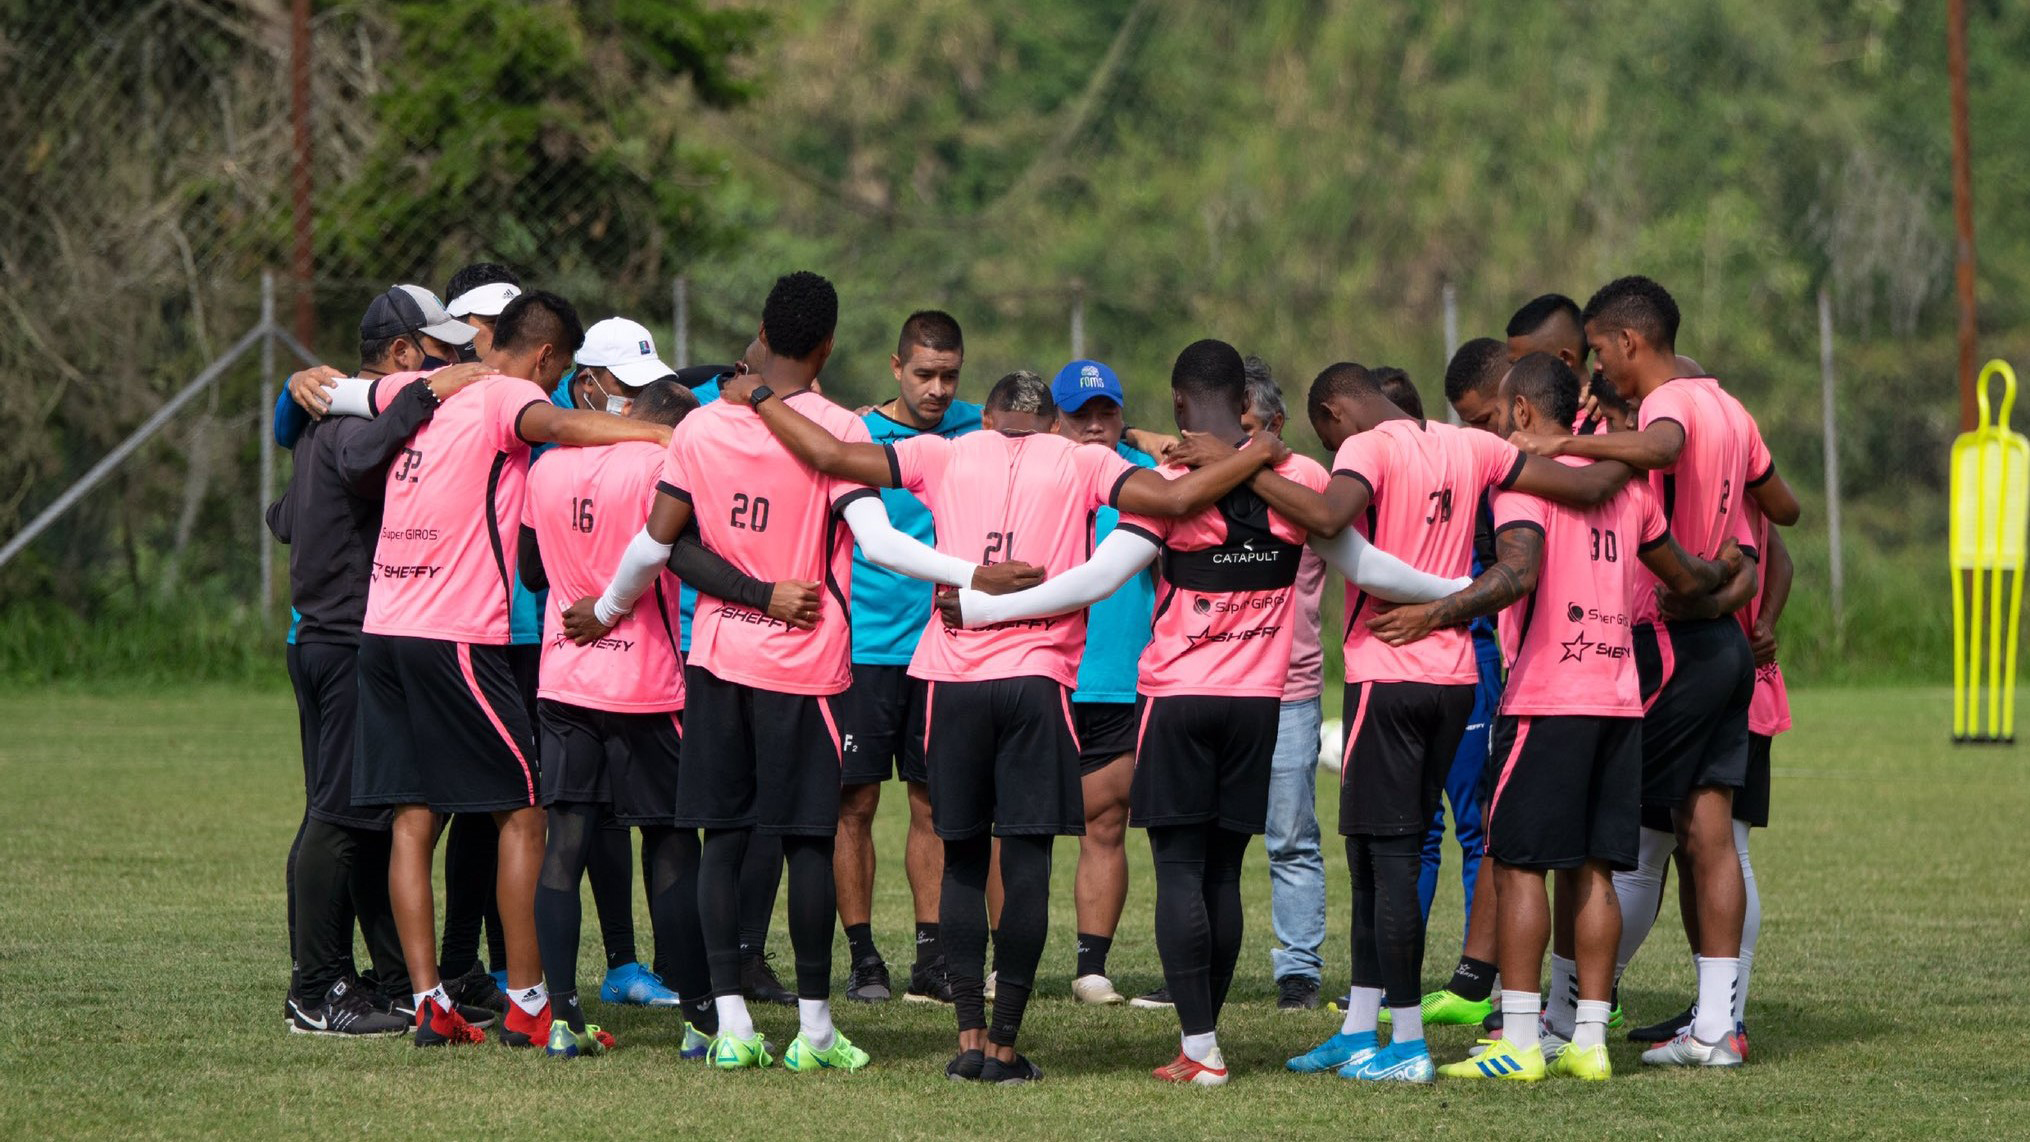 2do-gol-James-Rodriguez-Colombia-2-0-Uruguay-Casa-Blanca--OC